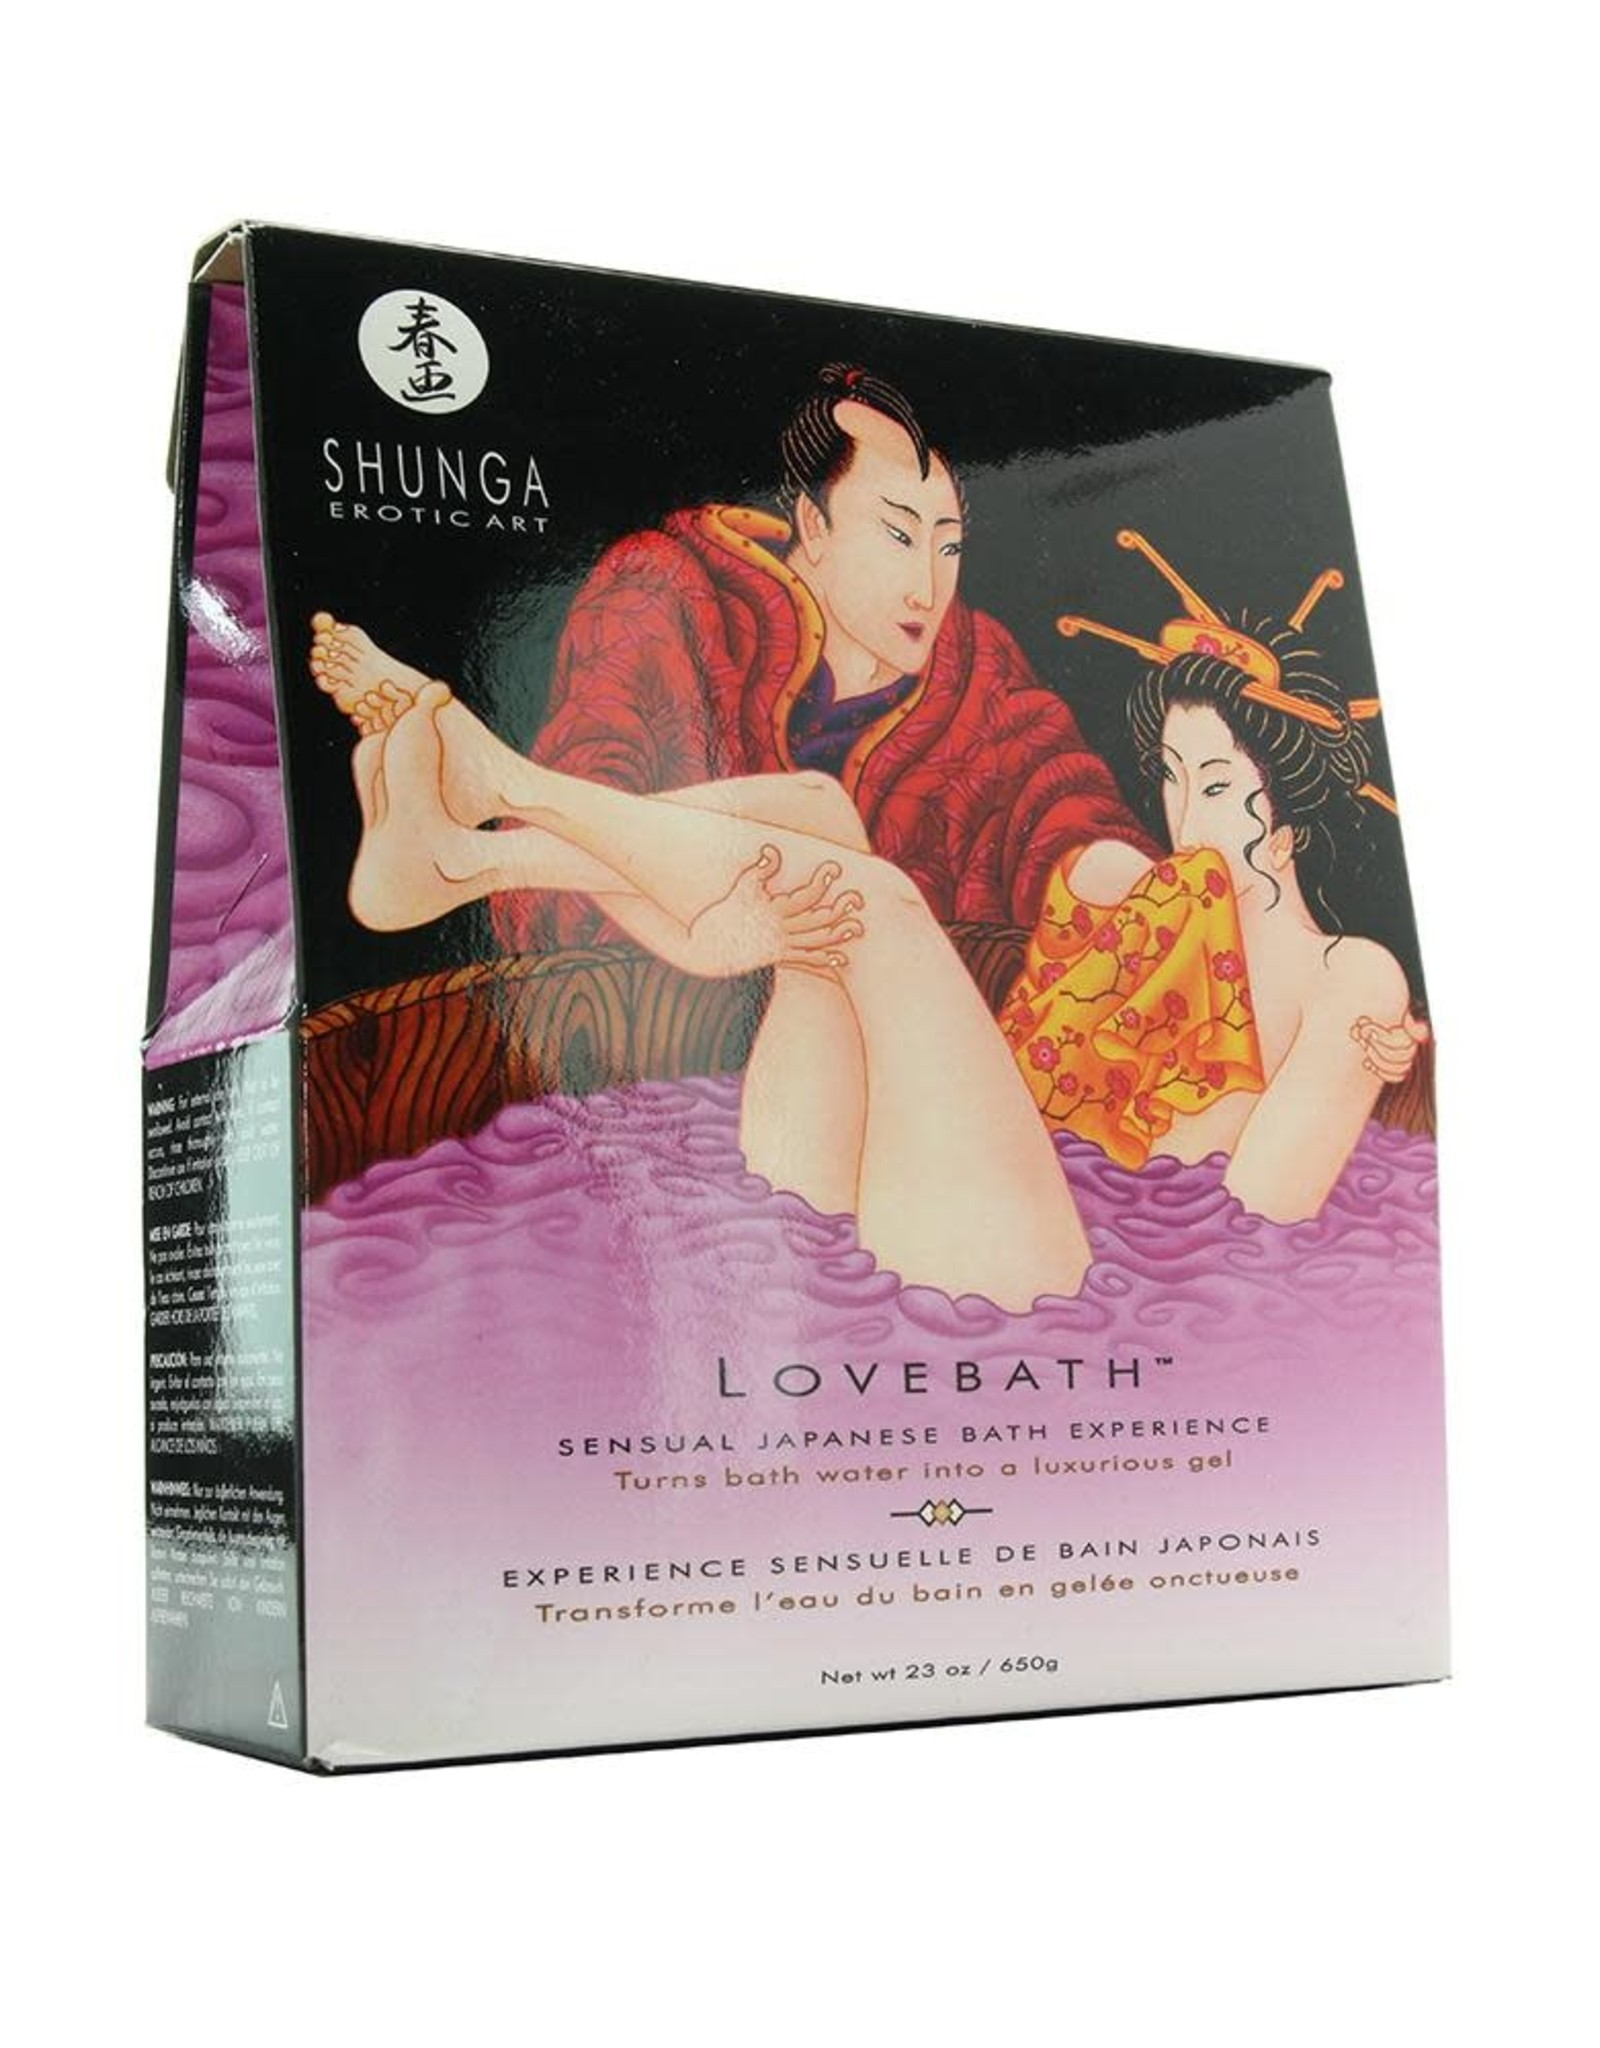 SHUNGA - LOVE BATH - SENSUAL LOTUS